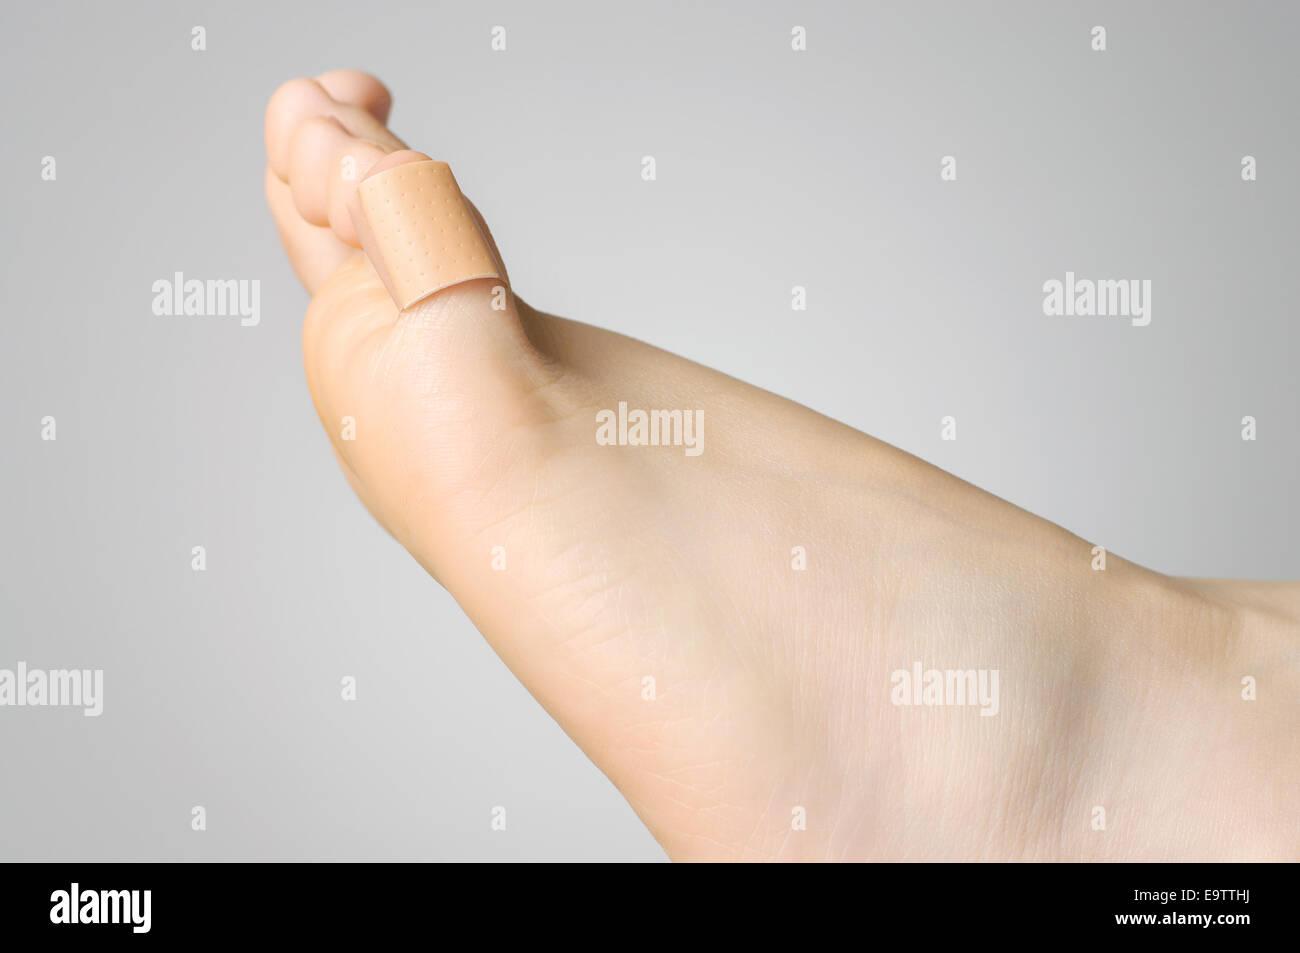 Foot Injury Stockfotos & Foot Injury Bilder - Alamy